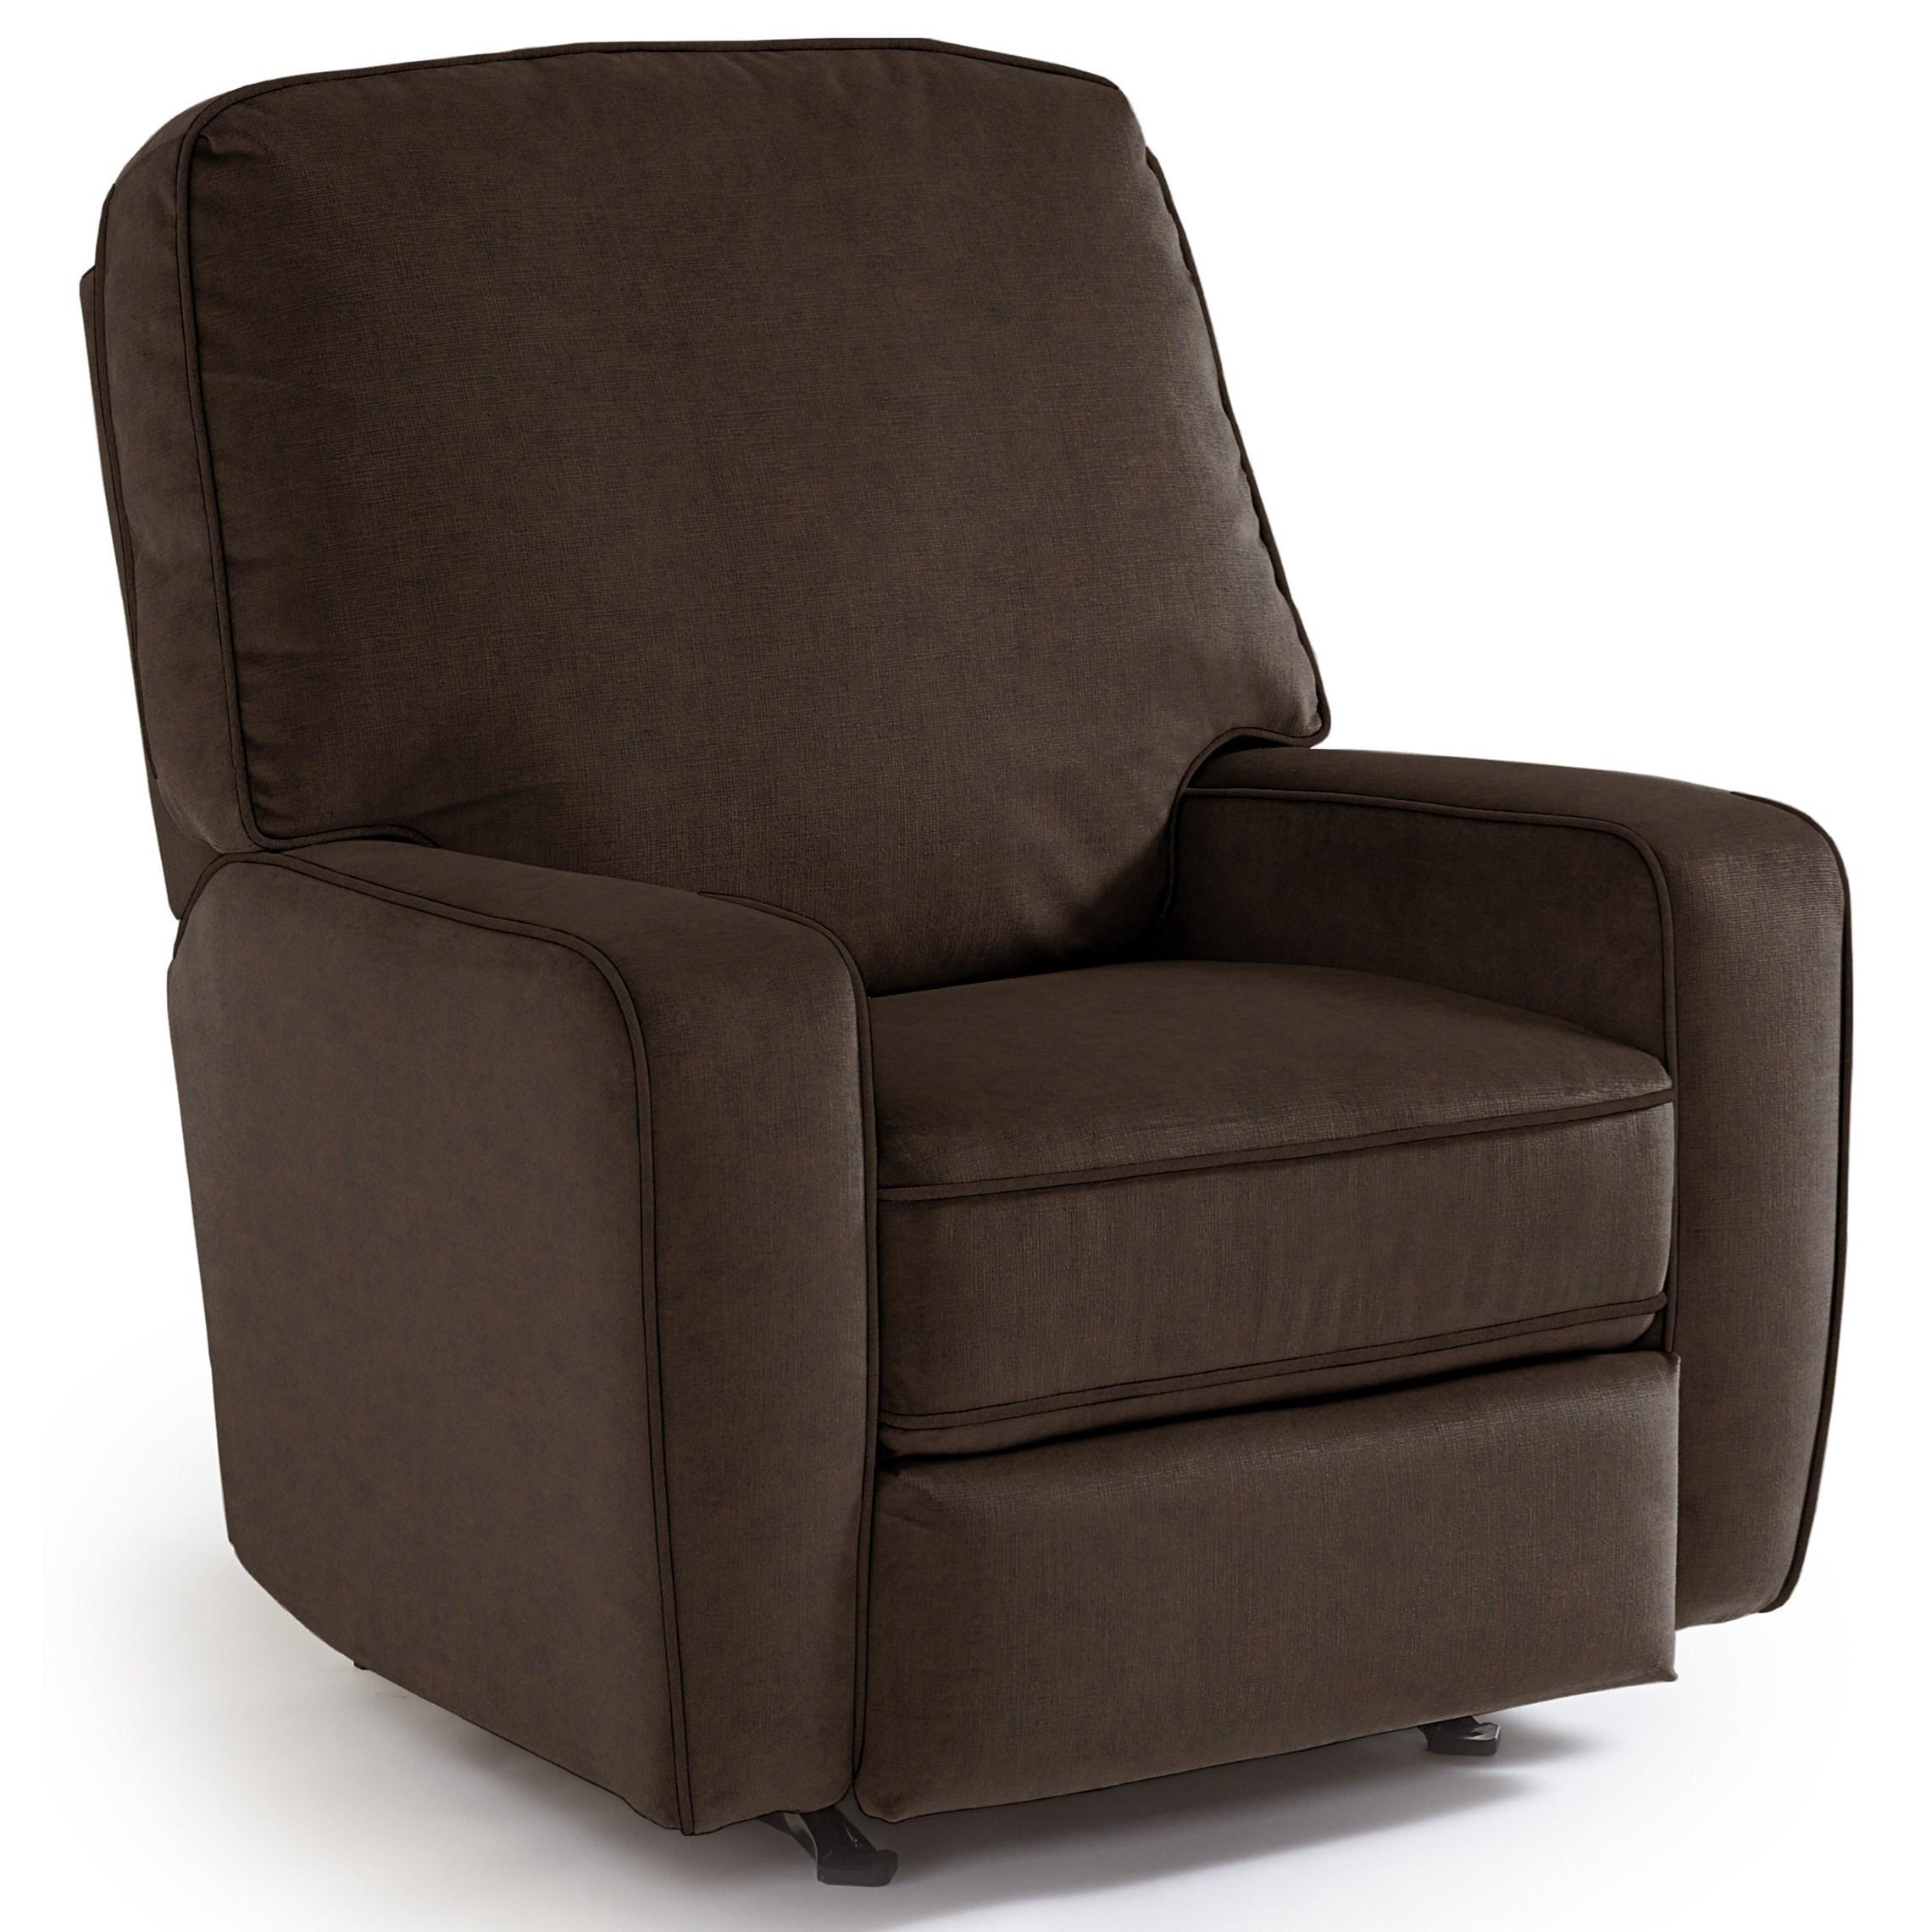 Medium Recliners Bilana Swivel Glider Recliner by Best Home Furnishings at Lucas Furniture & Mattress